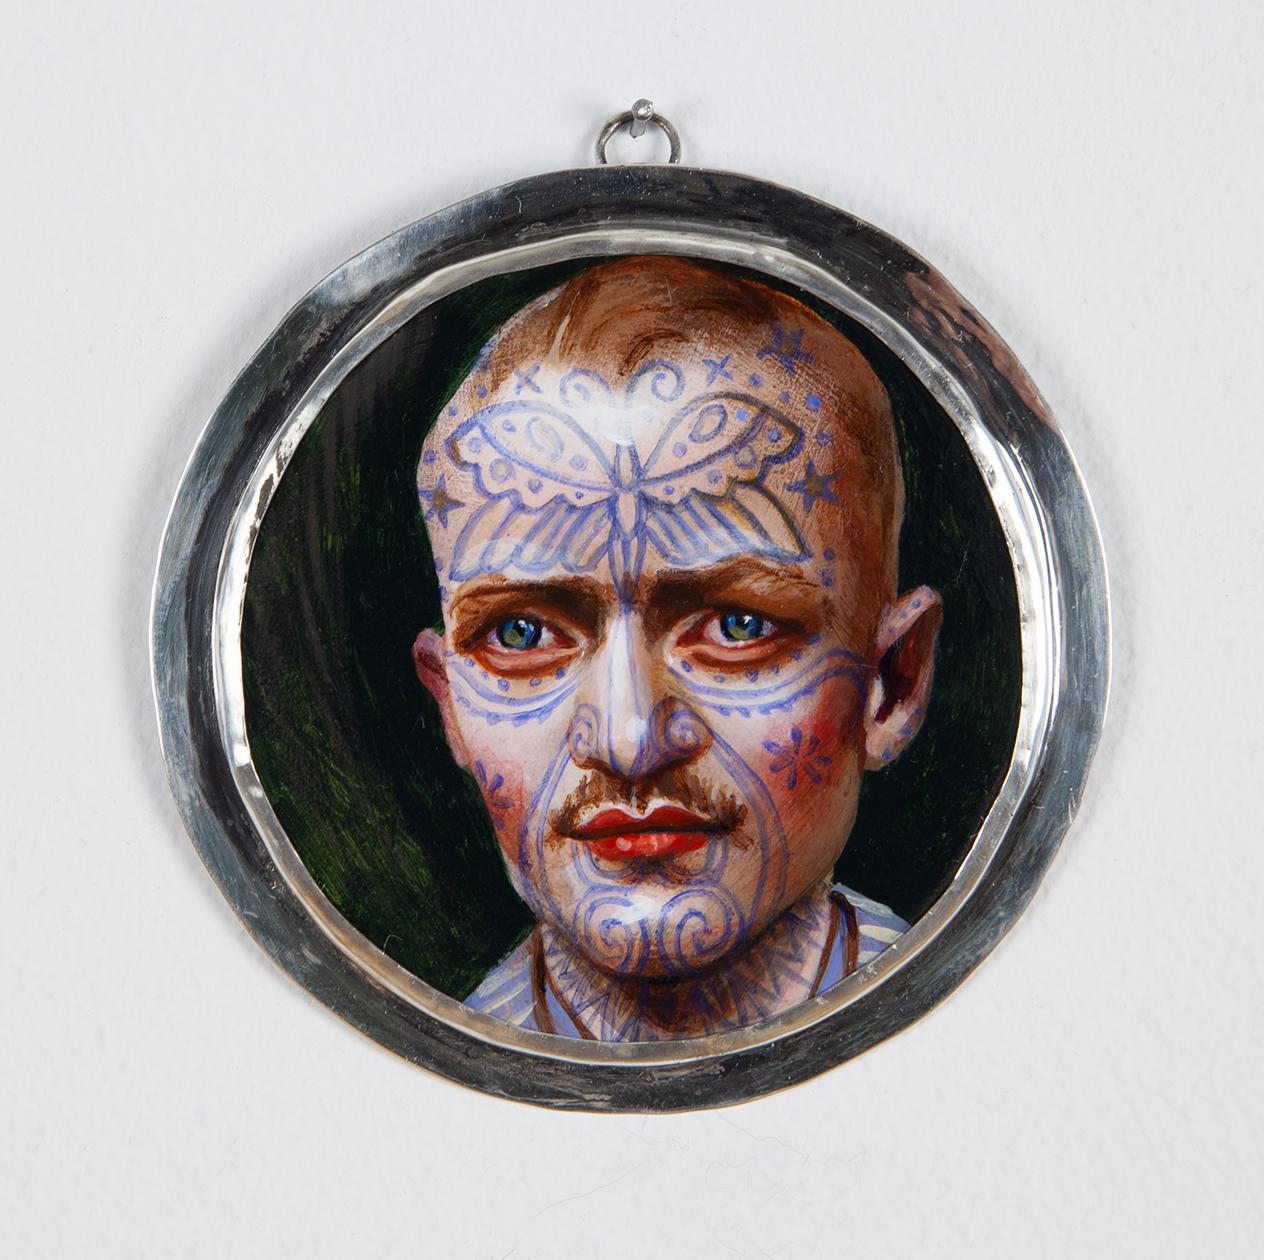 Blue Tattoo Forest Man, 2019 acrylic on wood 3 inch diameter